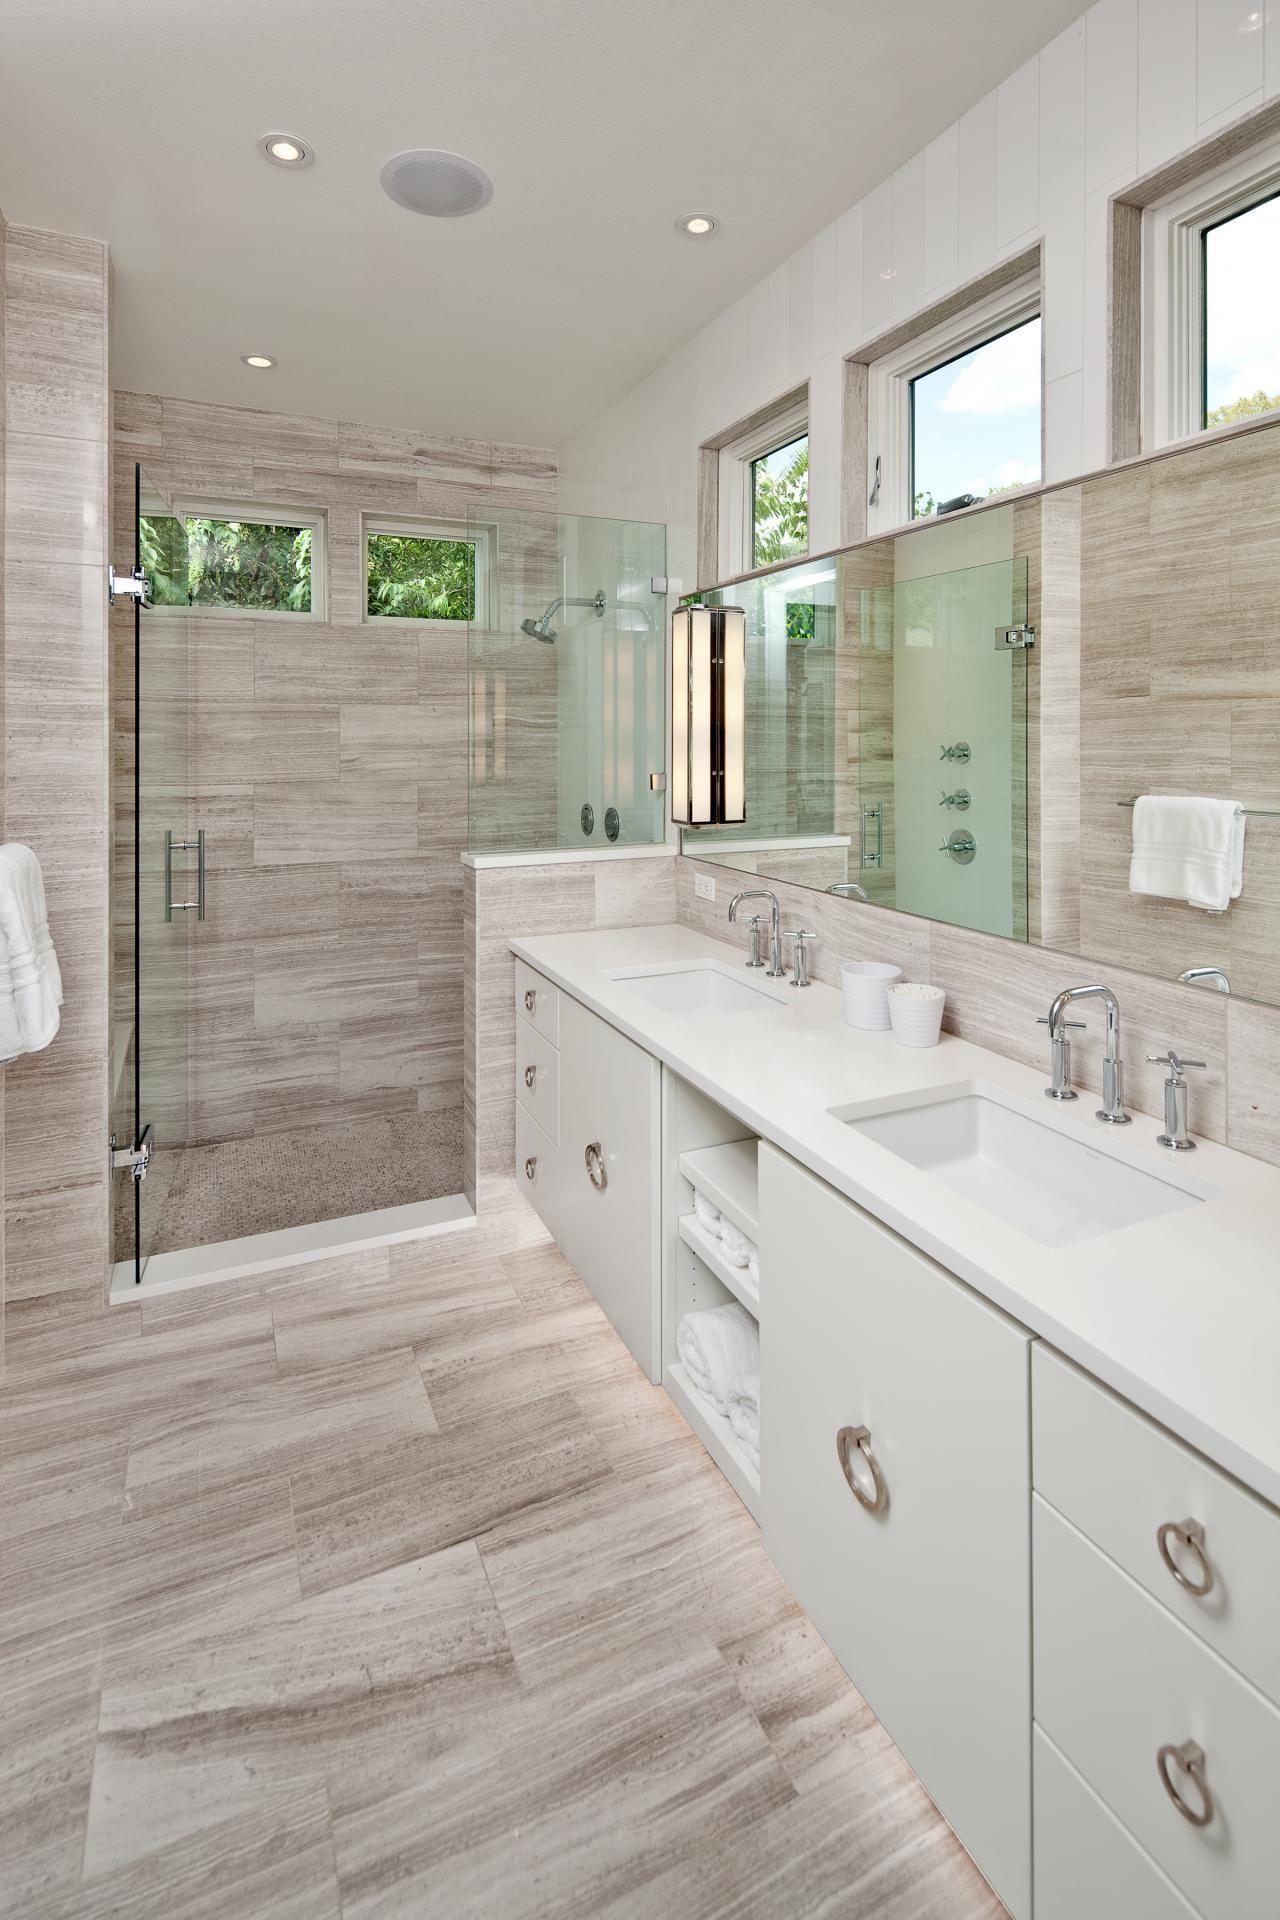 Gray And White Modern Spa Bathroom With Walk In Shower Wood Tile Bathroom Wood Look Tile Bathroom Bathroom Spa